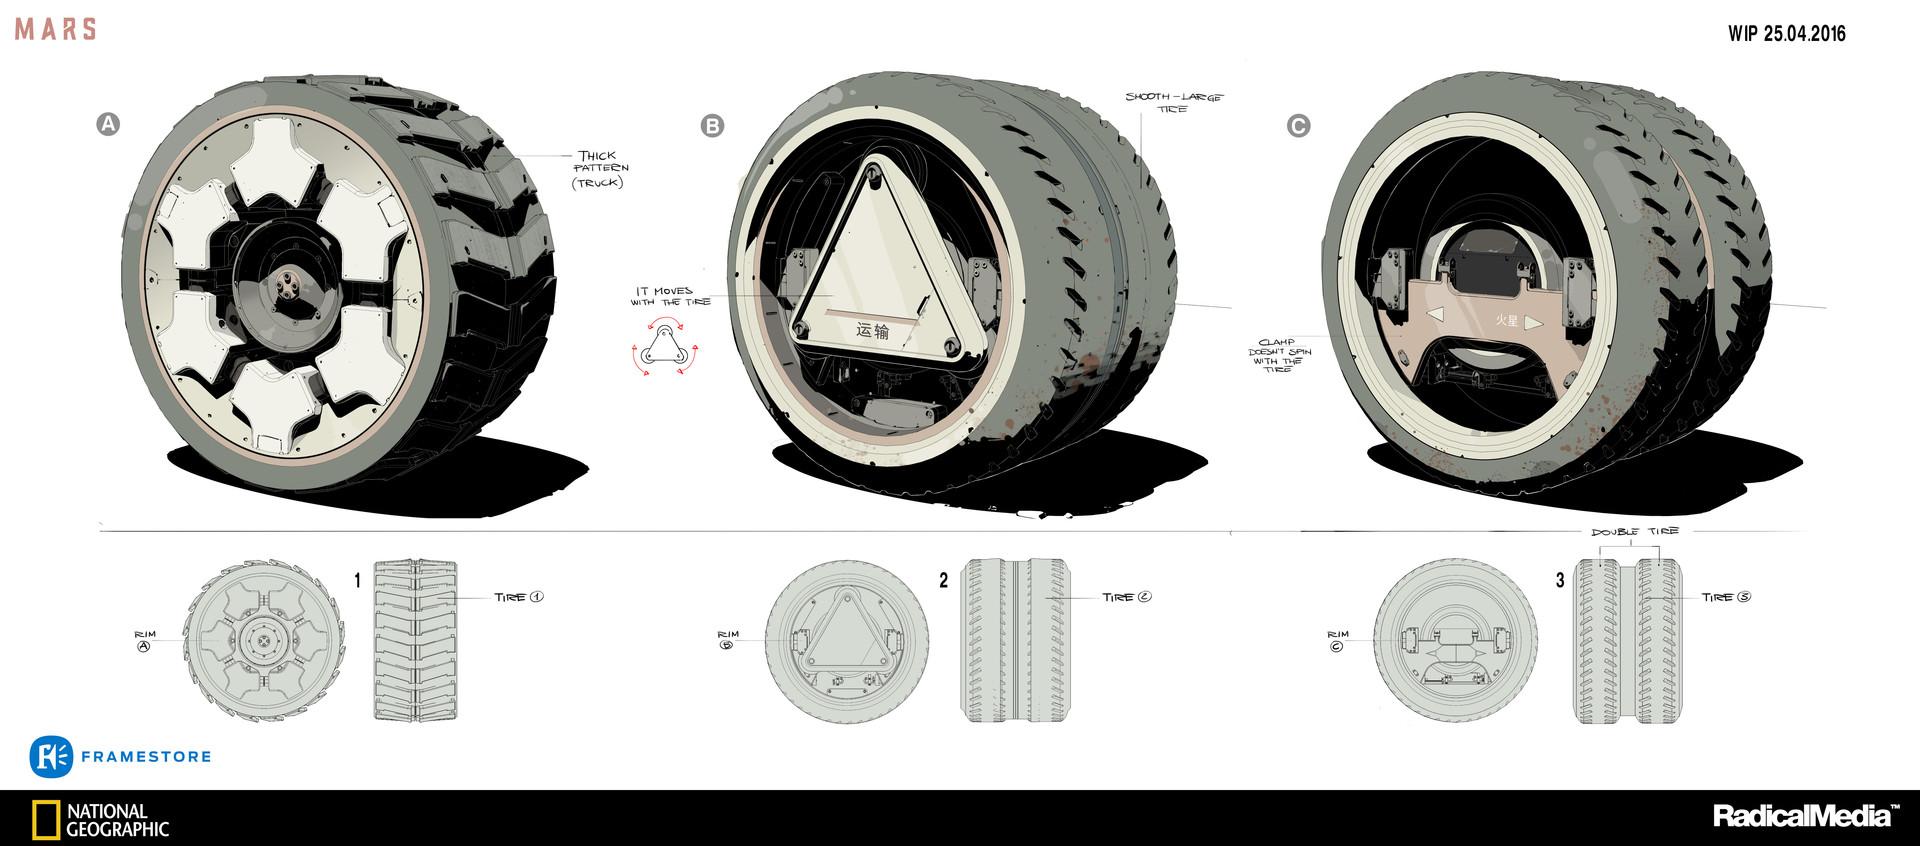 oscar-cafaro-rover-wheels.jpg